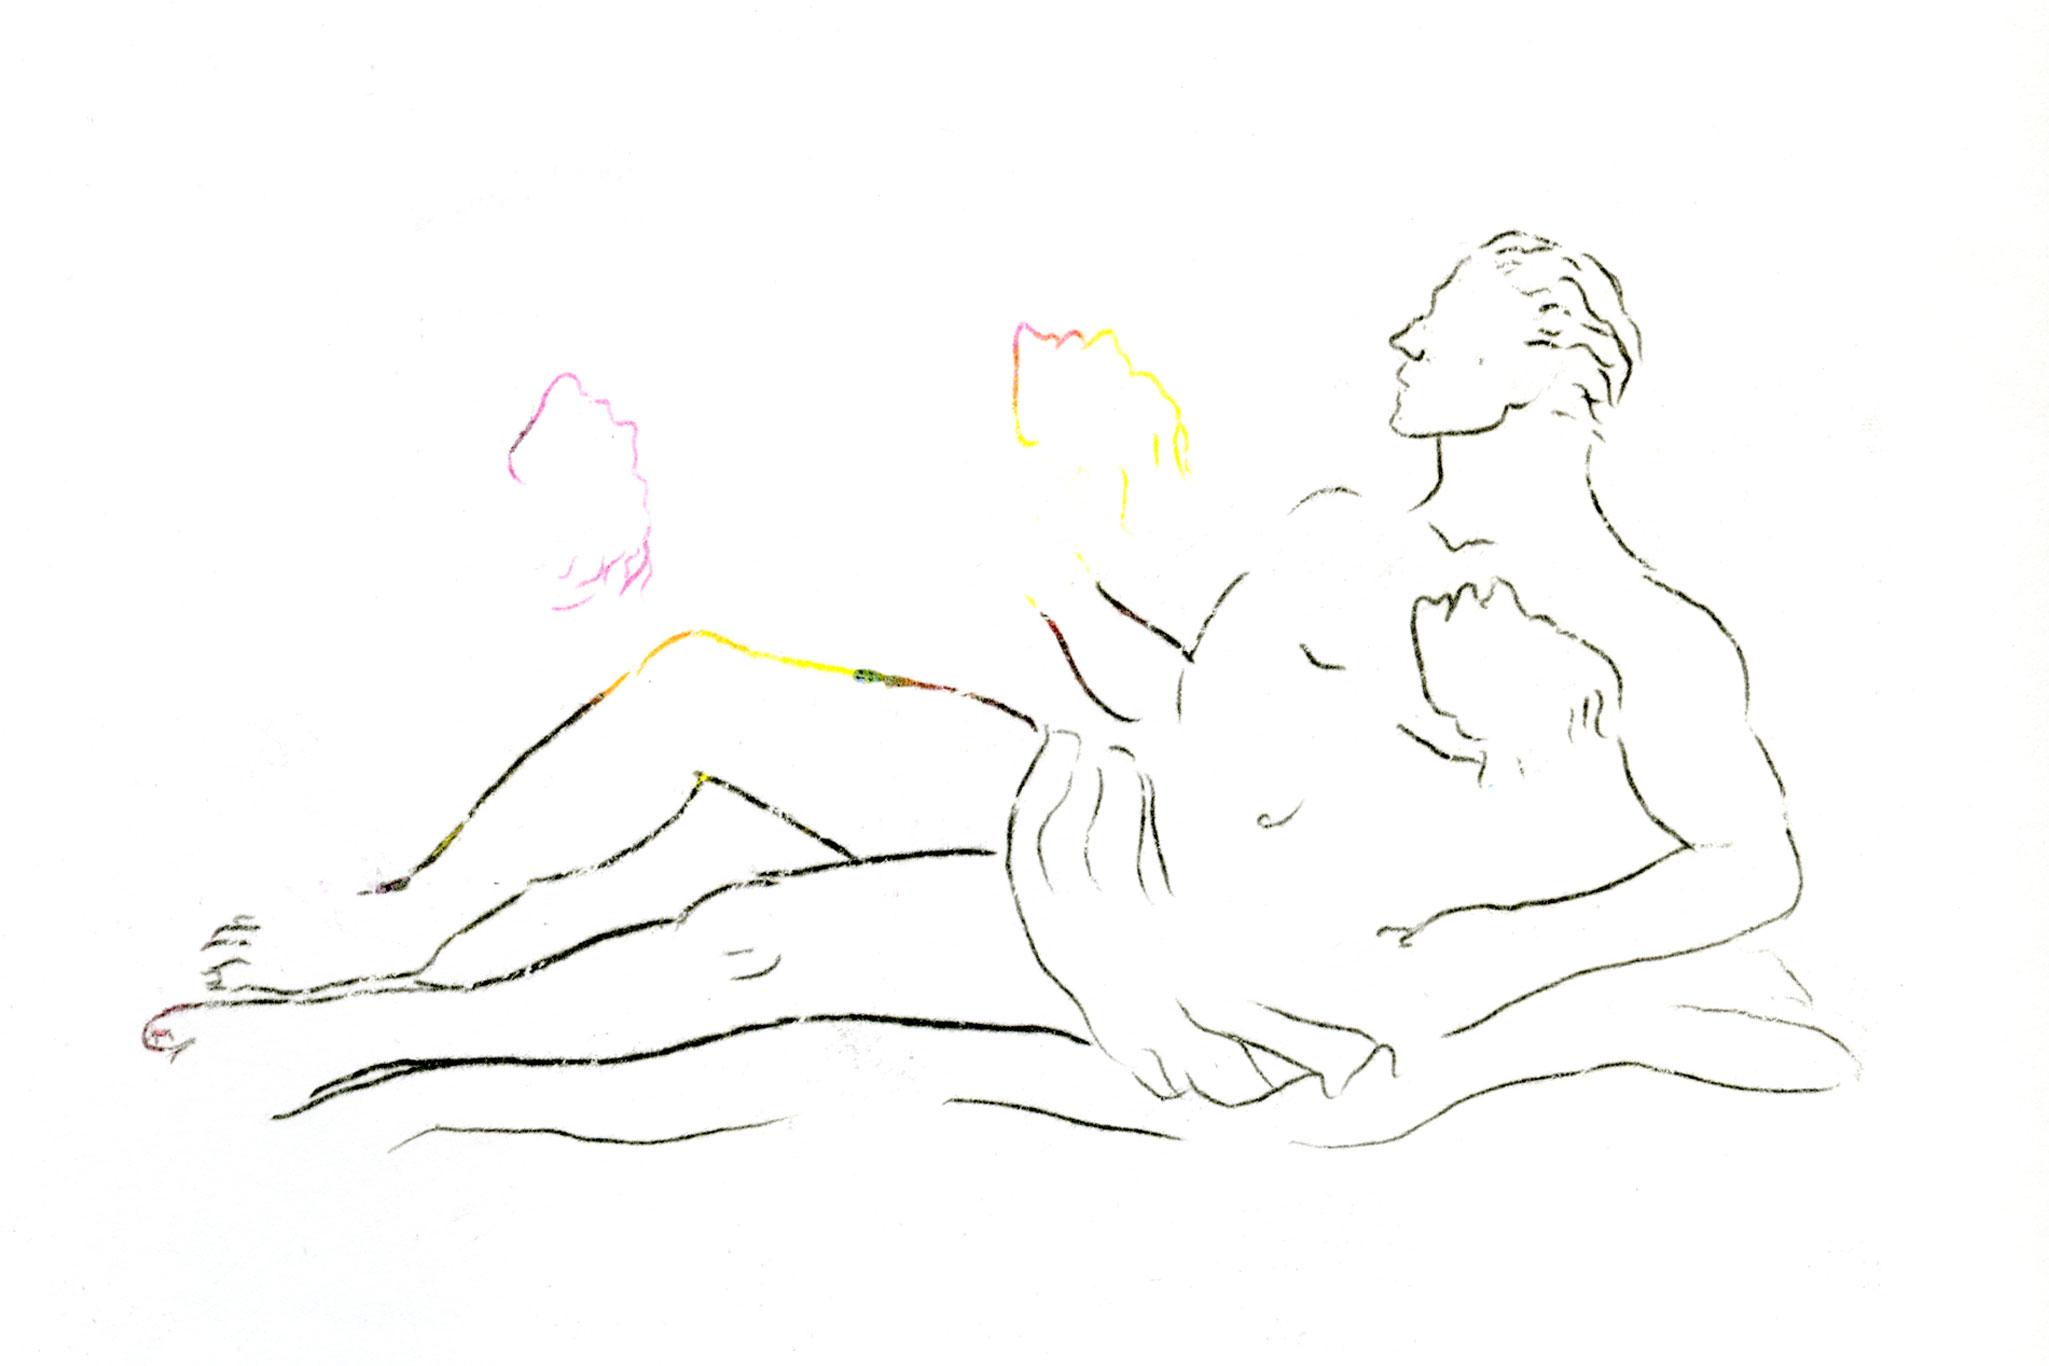 Claudia_Lemke_Untitled_15_Website_Galerie.jpg